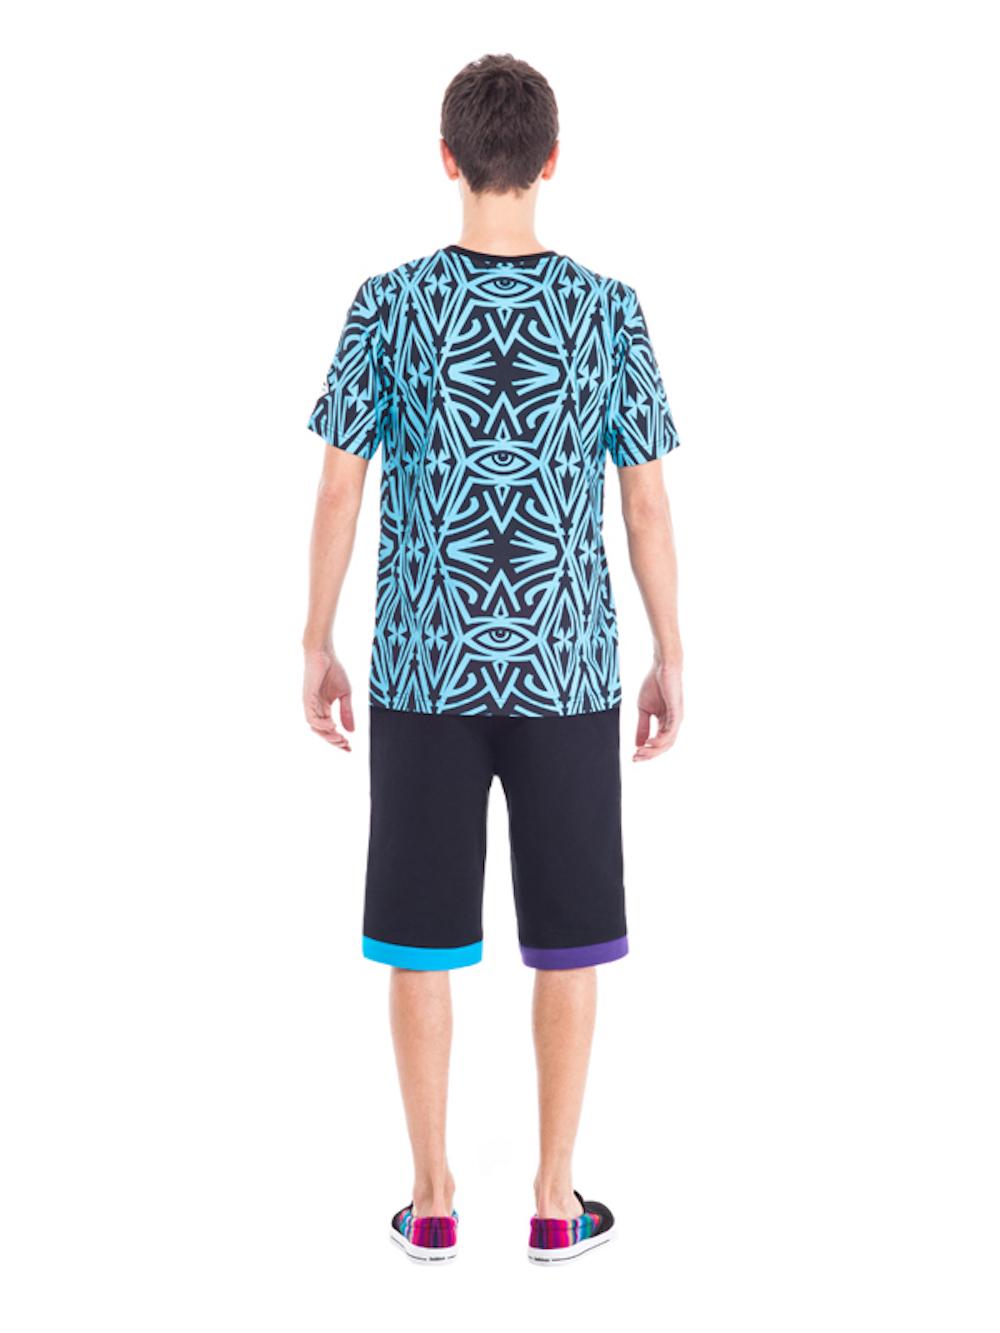 Carabus T-shirt (Navy Blue) - Okuaku